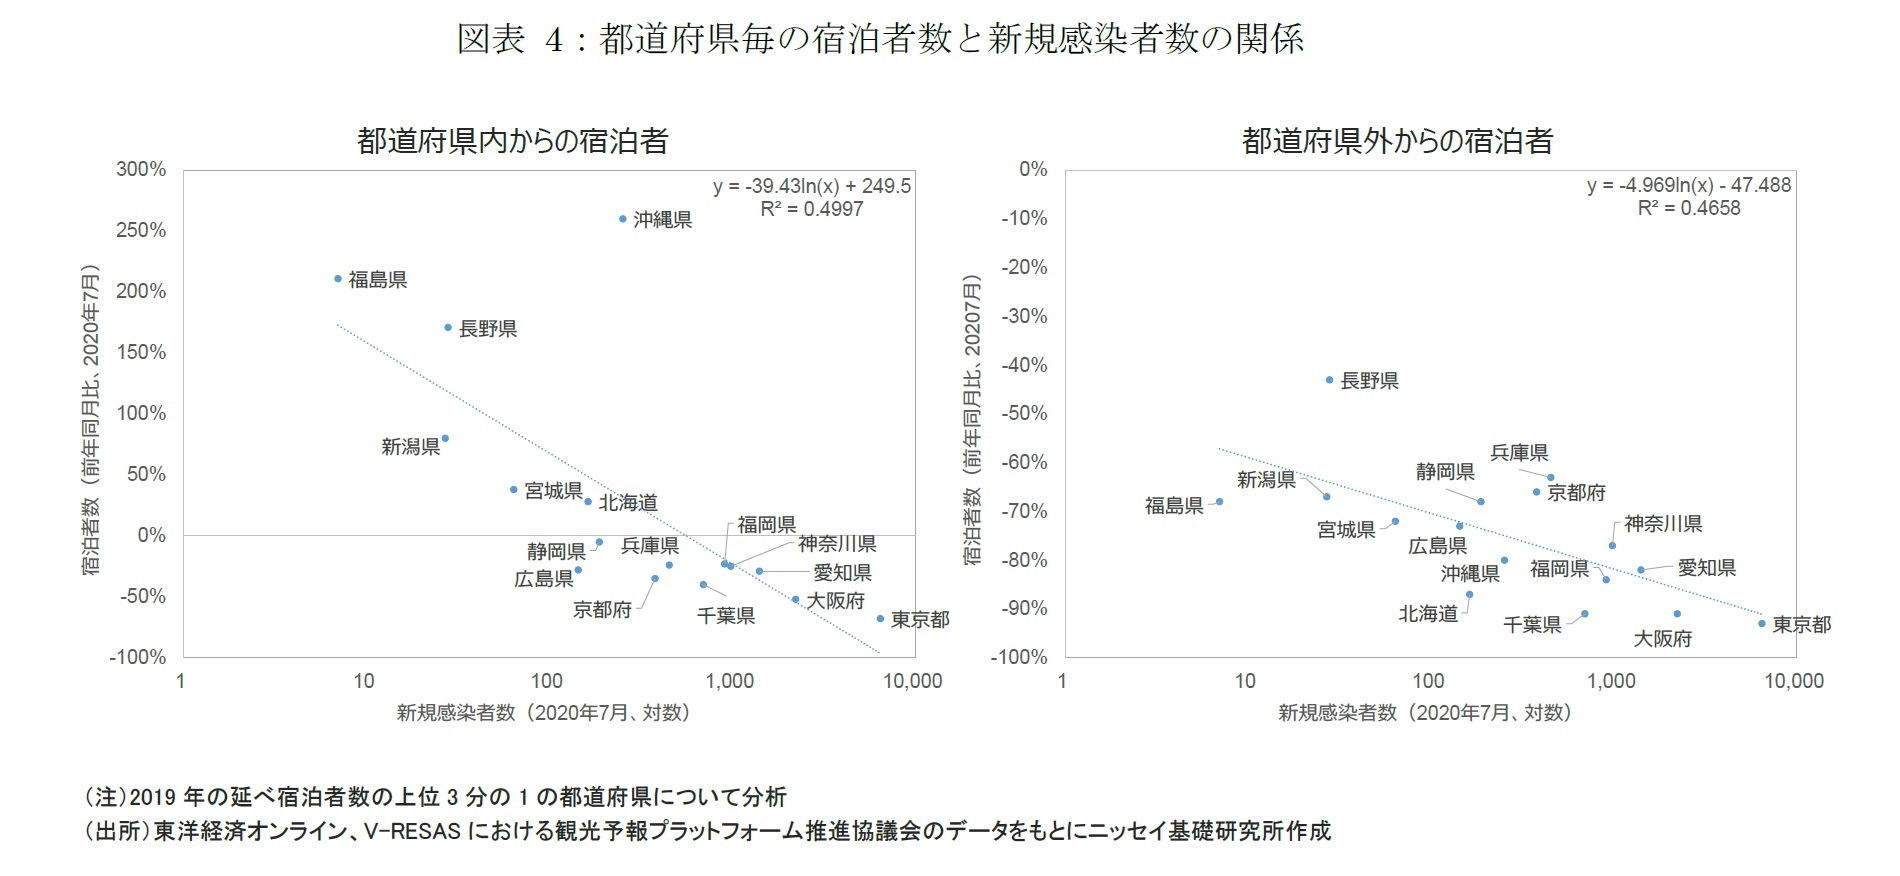 図表 4:都道府県毎の宿泊者数と新規感染者数の関係